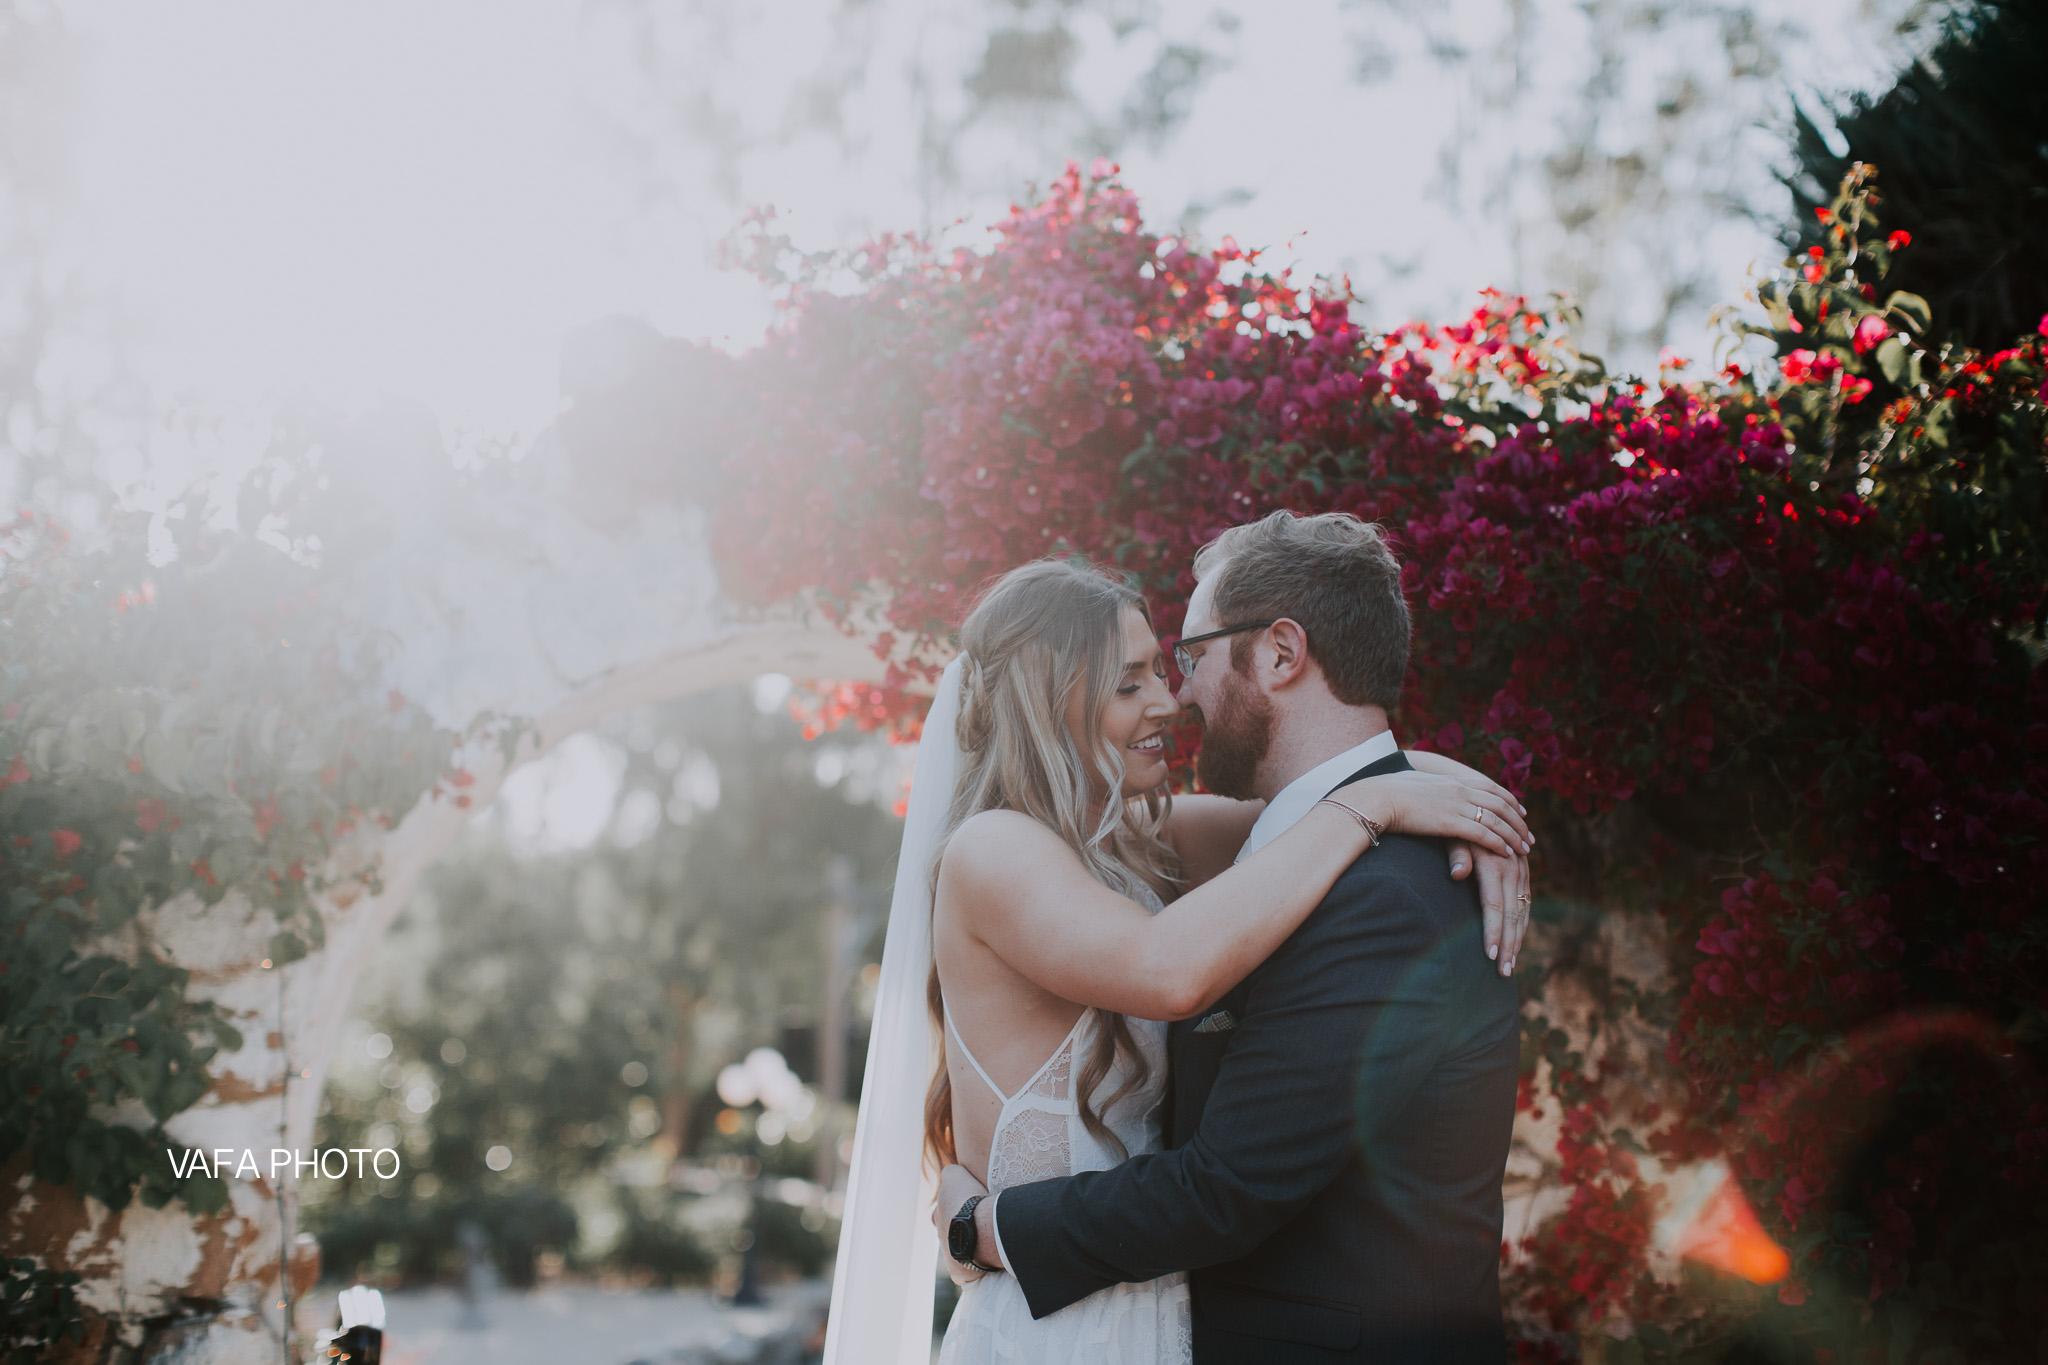 Leo-Carrillo-Ranch-Wedding-Lauren-Mike-Vafa-Photo-763.jpg